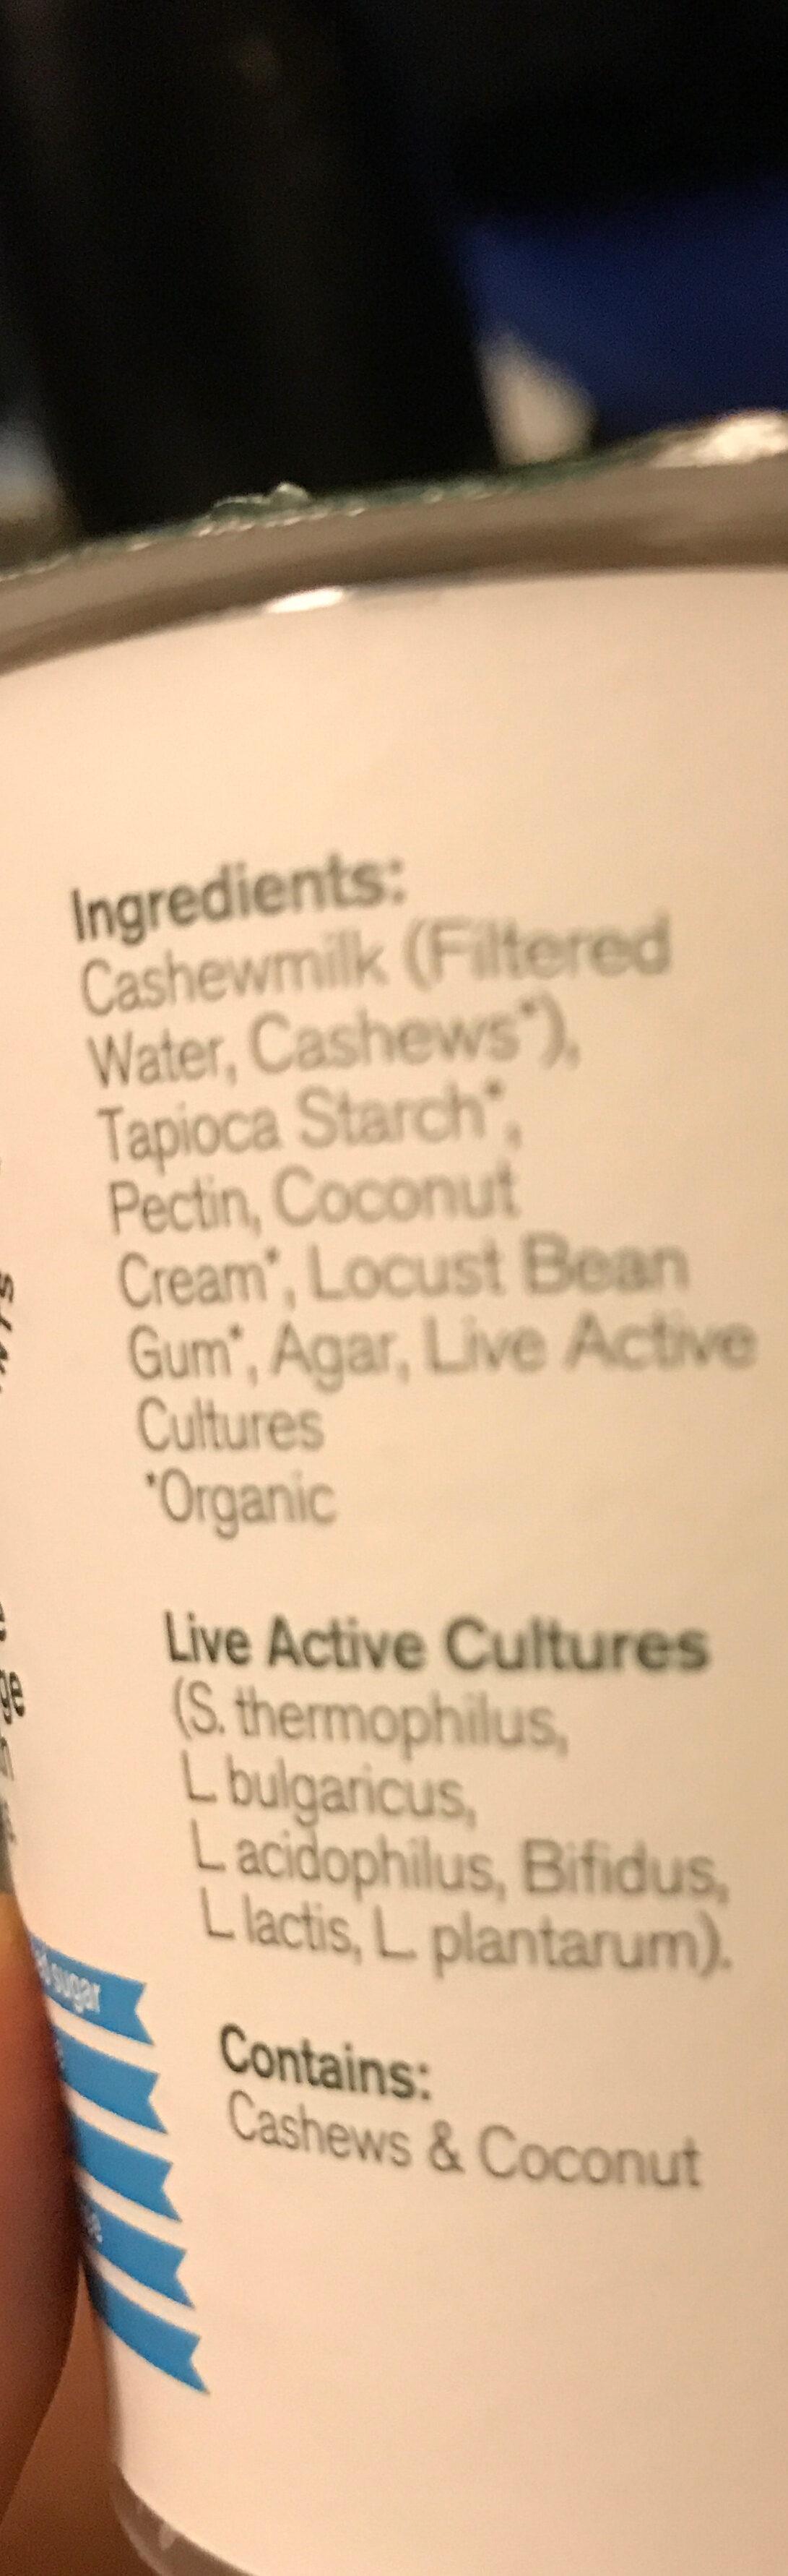 Organic dairy-free cashewgurt - Ingredients